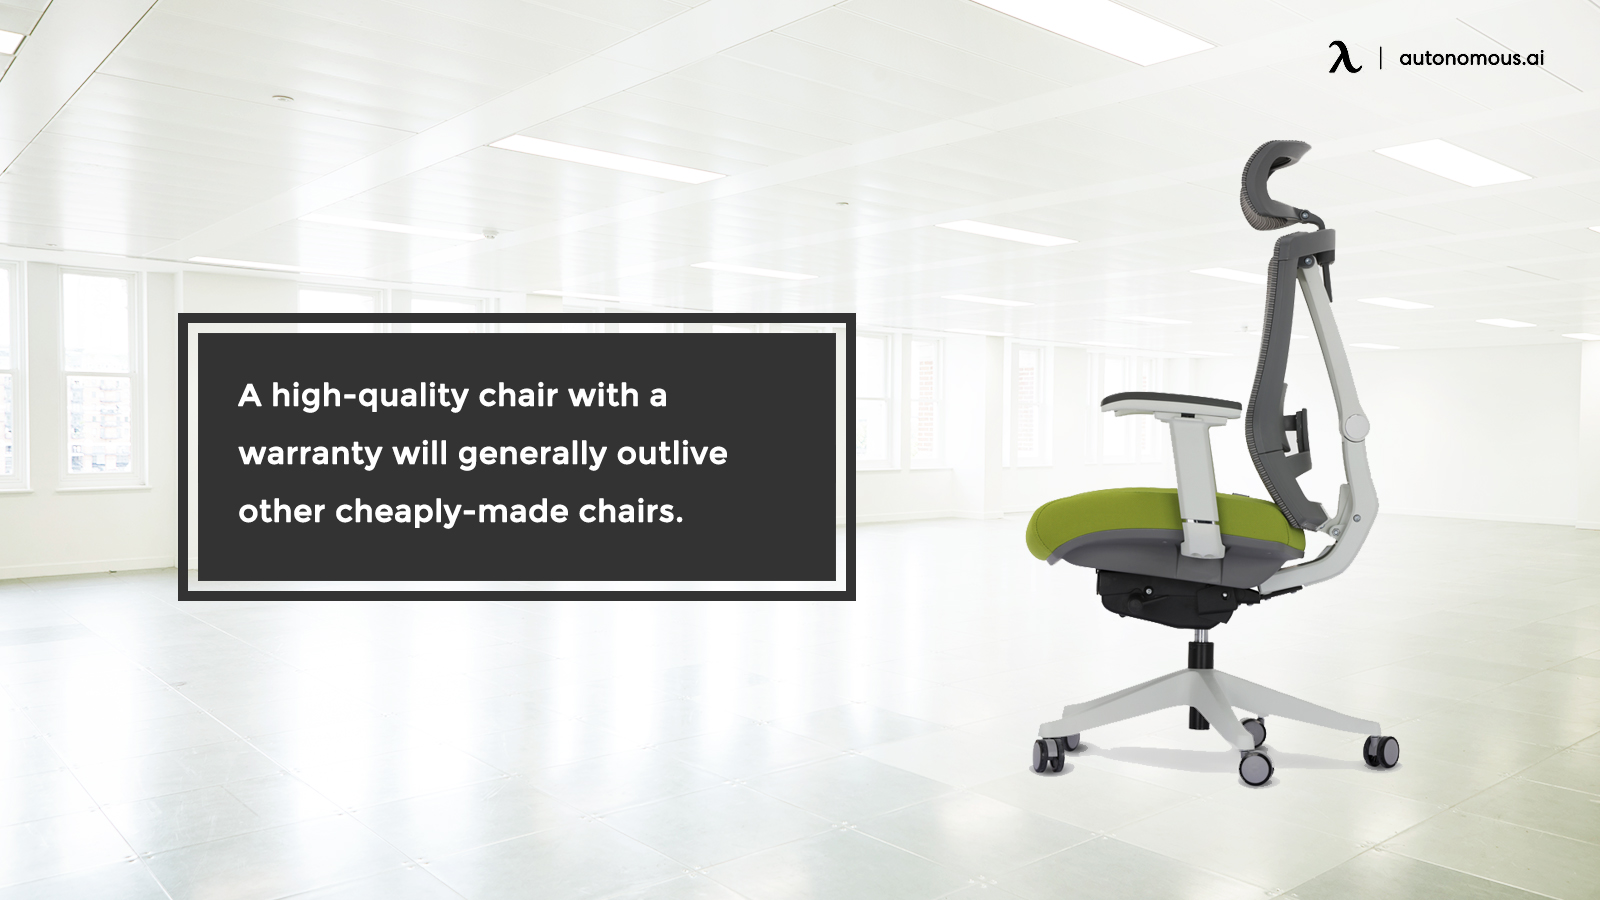 High quality chair warranty